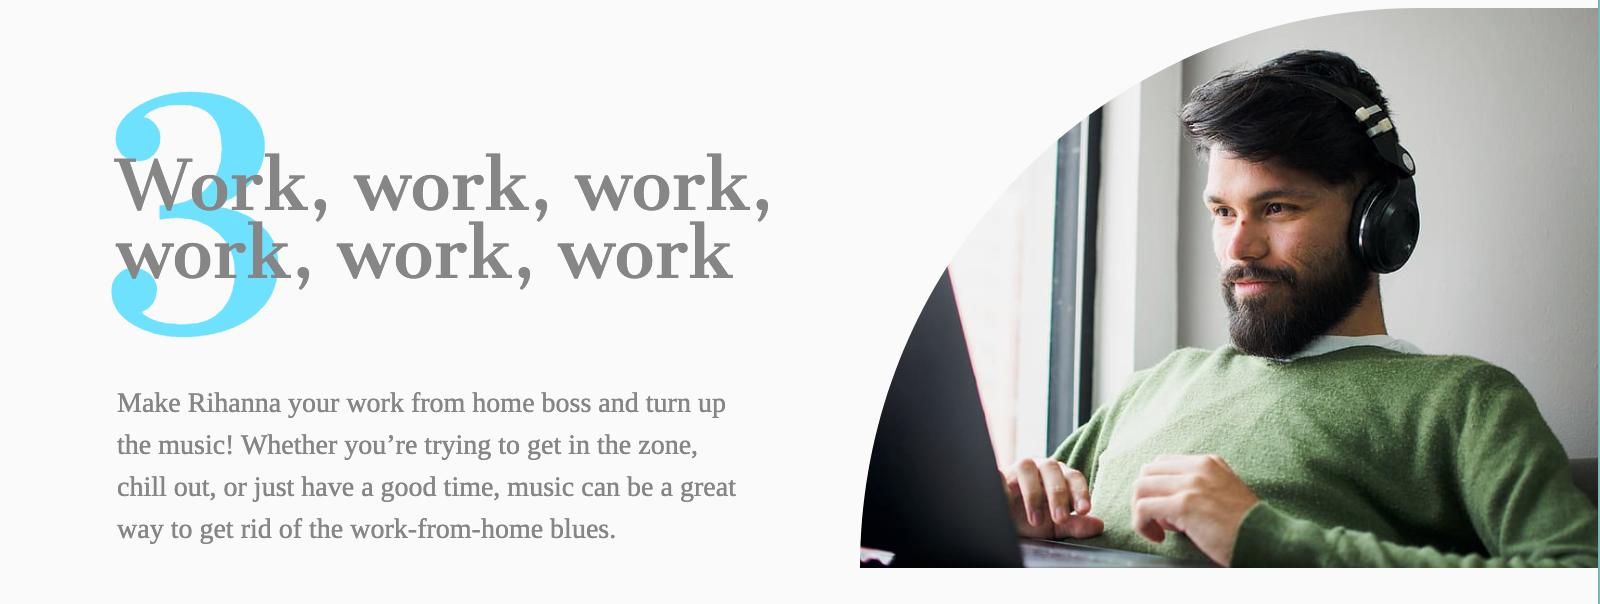 Work, work, work, work, work, work infobit